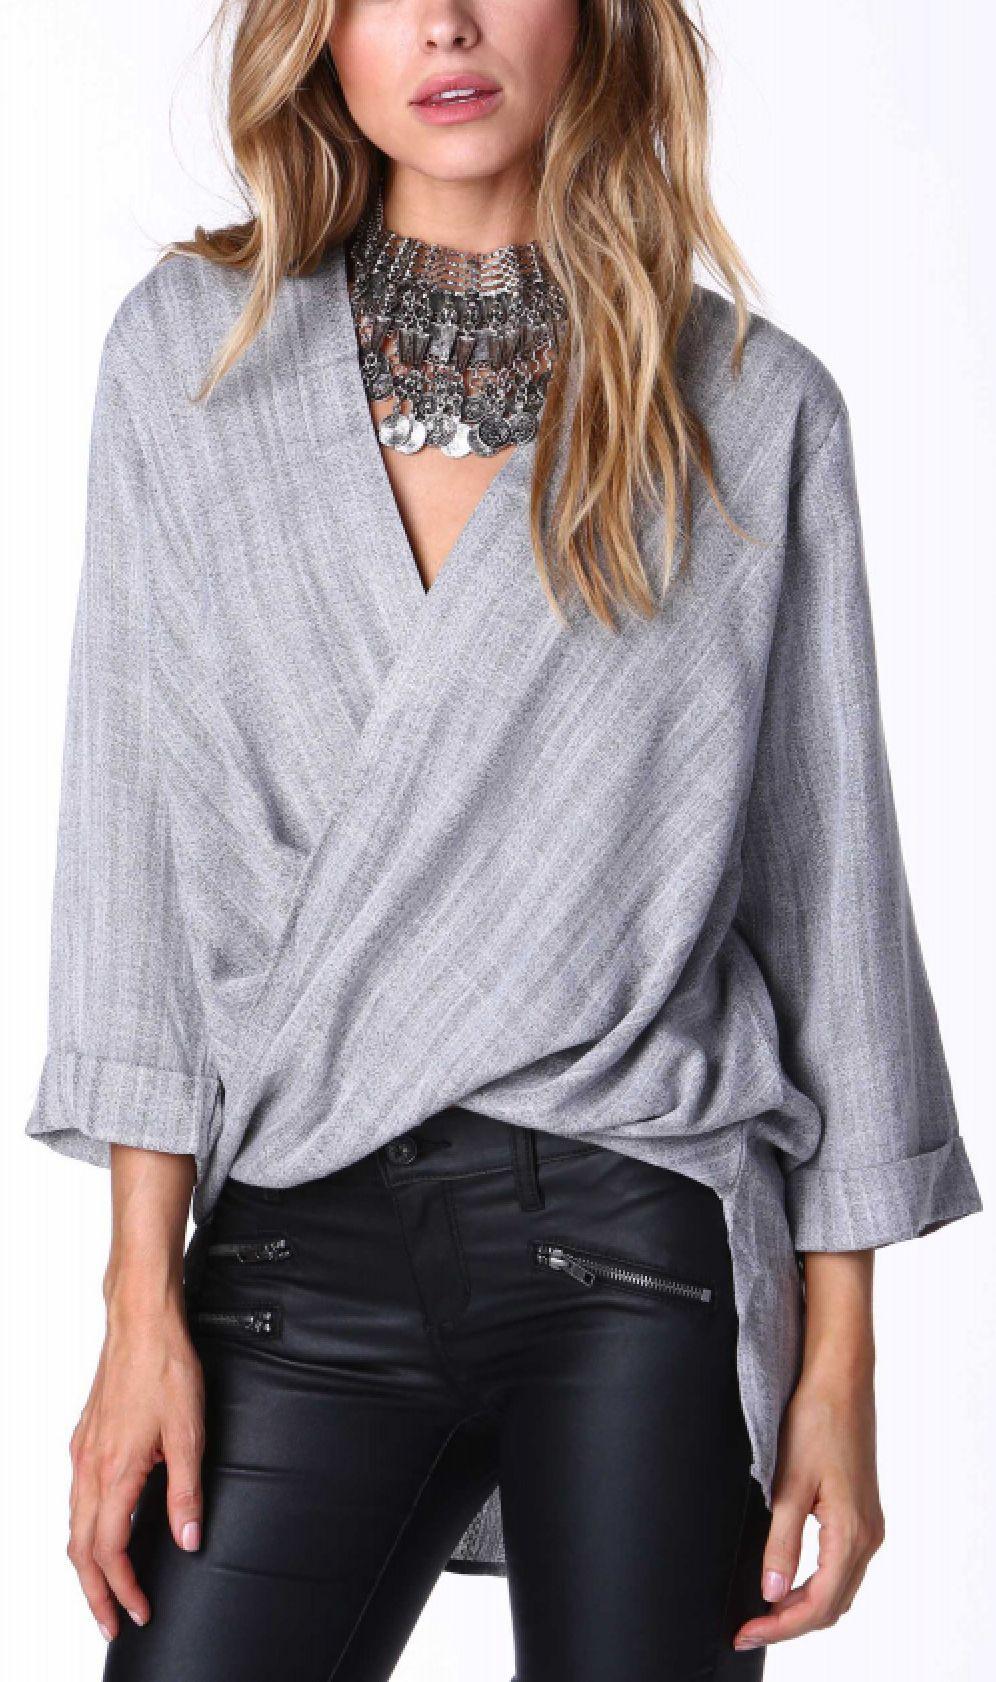 Twist blouse